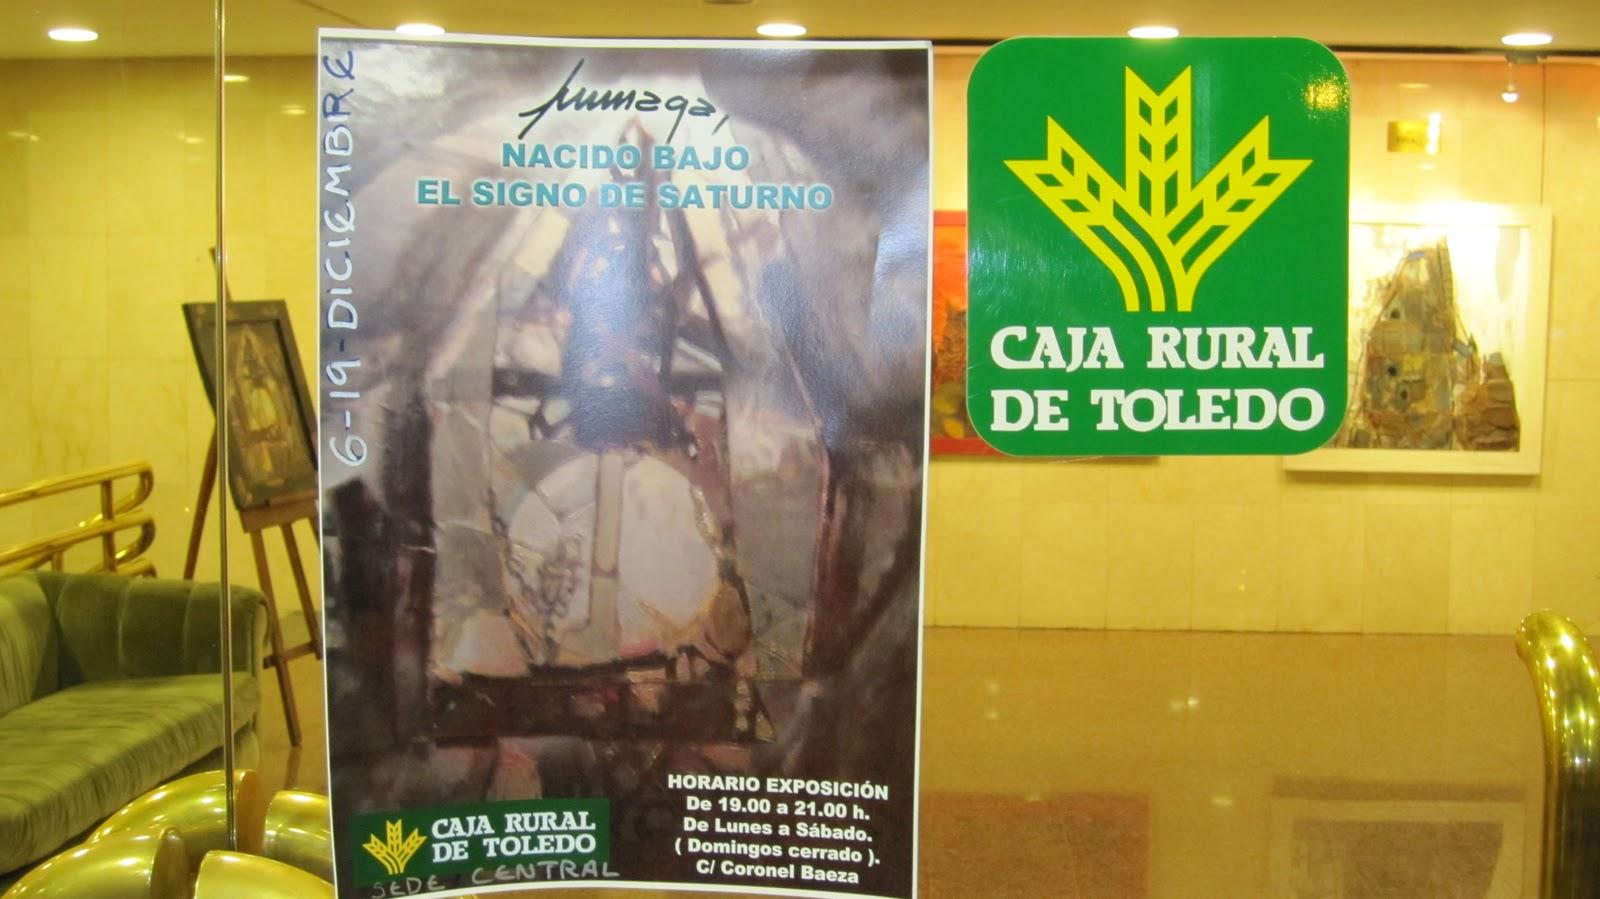 Blog de tini exposicion en la caja rural de toledo for Caja rural de toledo oficinas